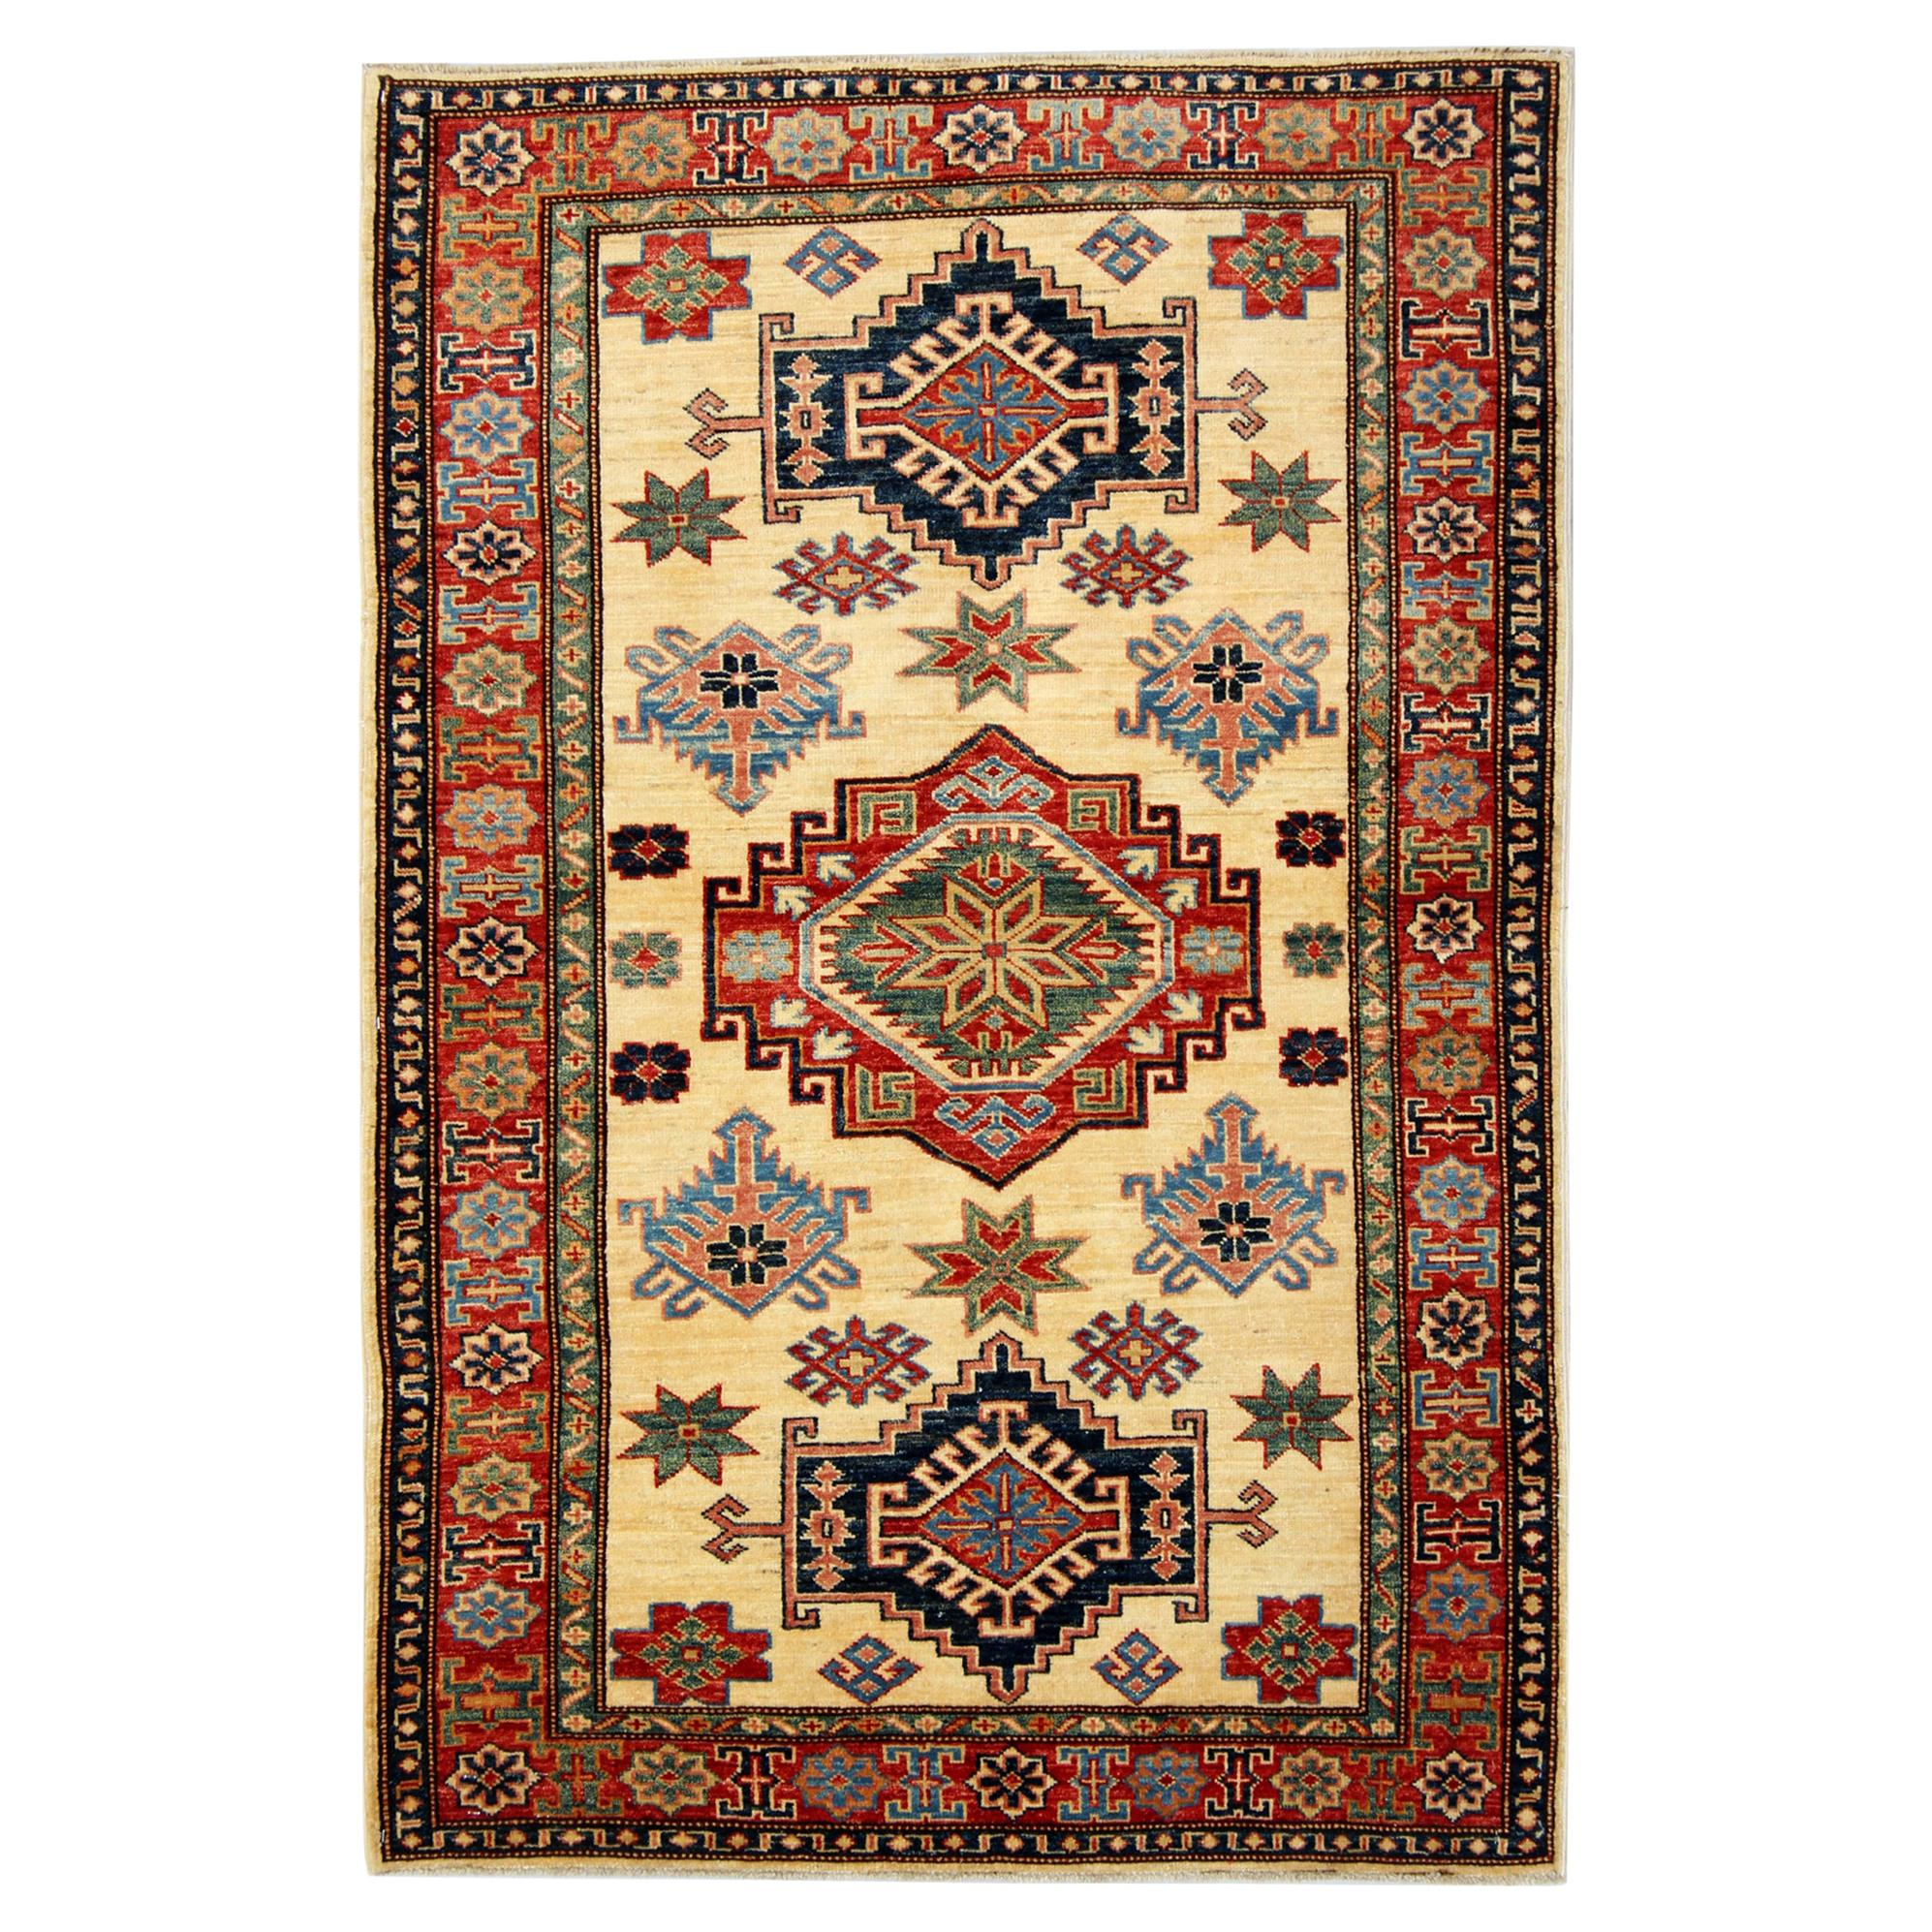 Handmade Kazak Rugs, Geometric Rugs, Carpet from Afghanistan